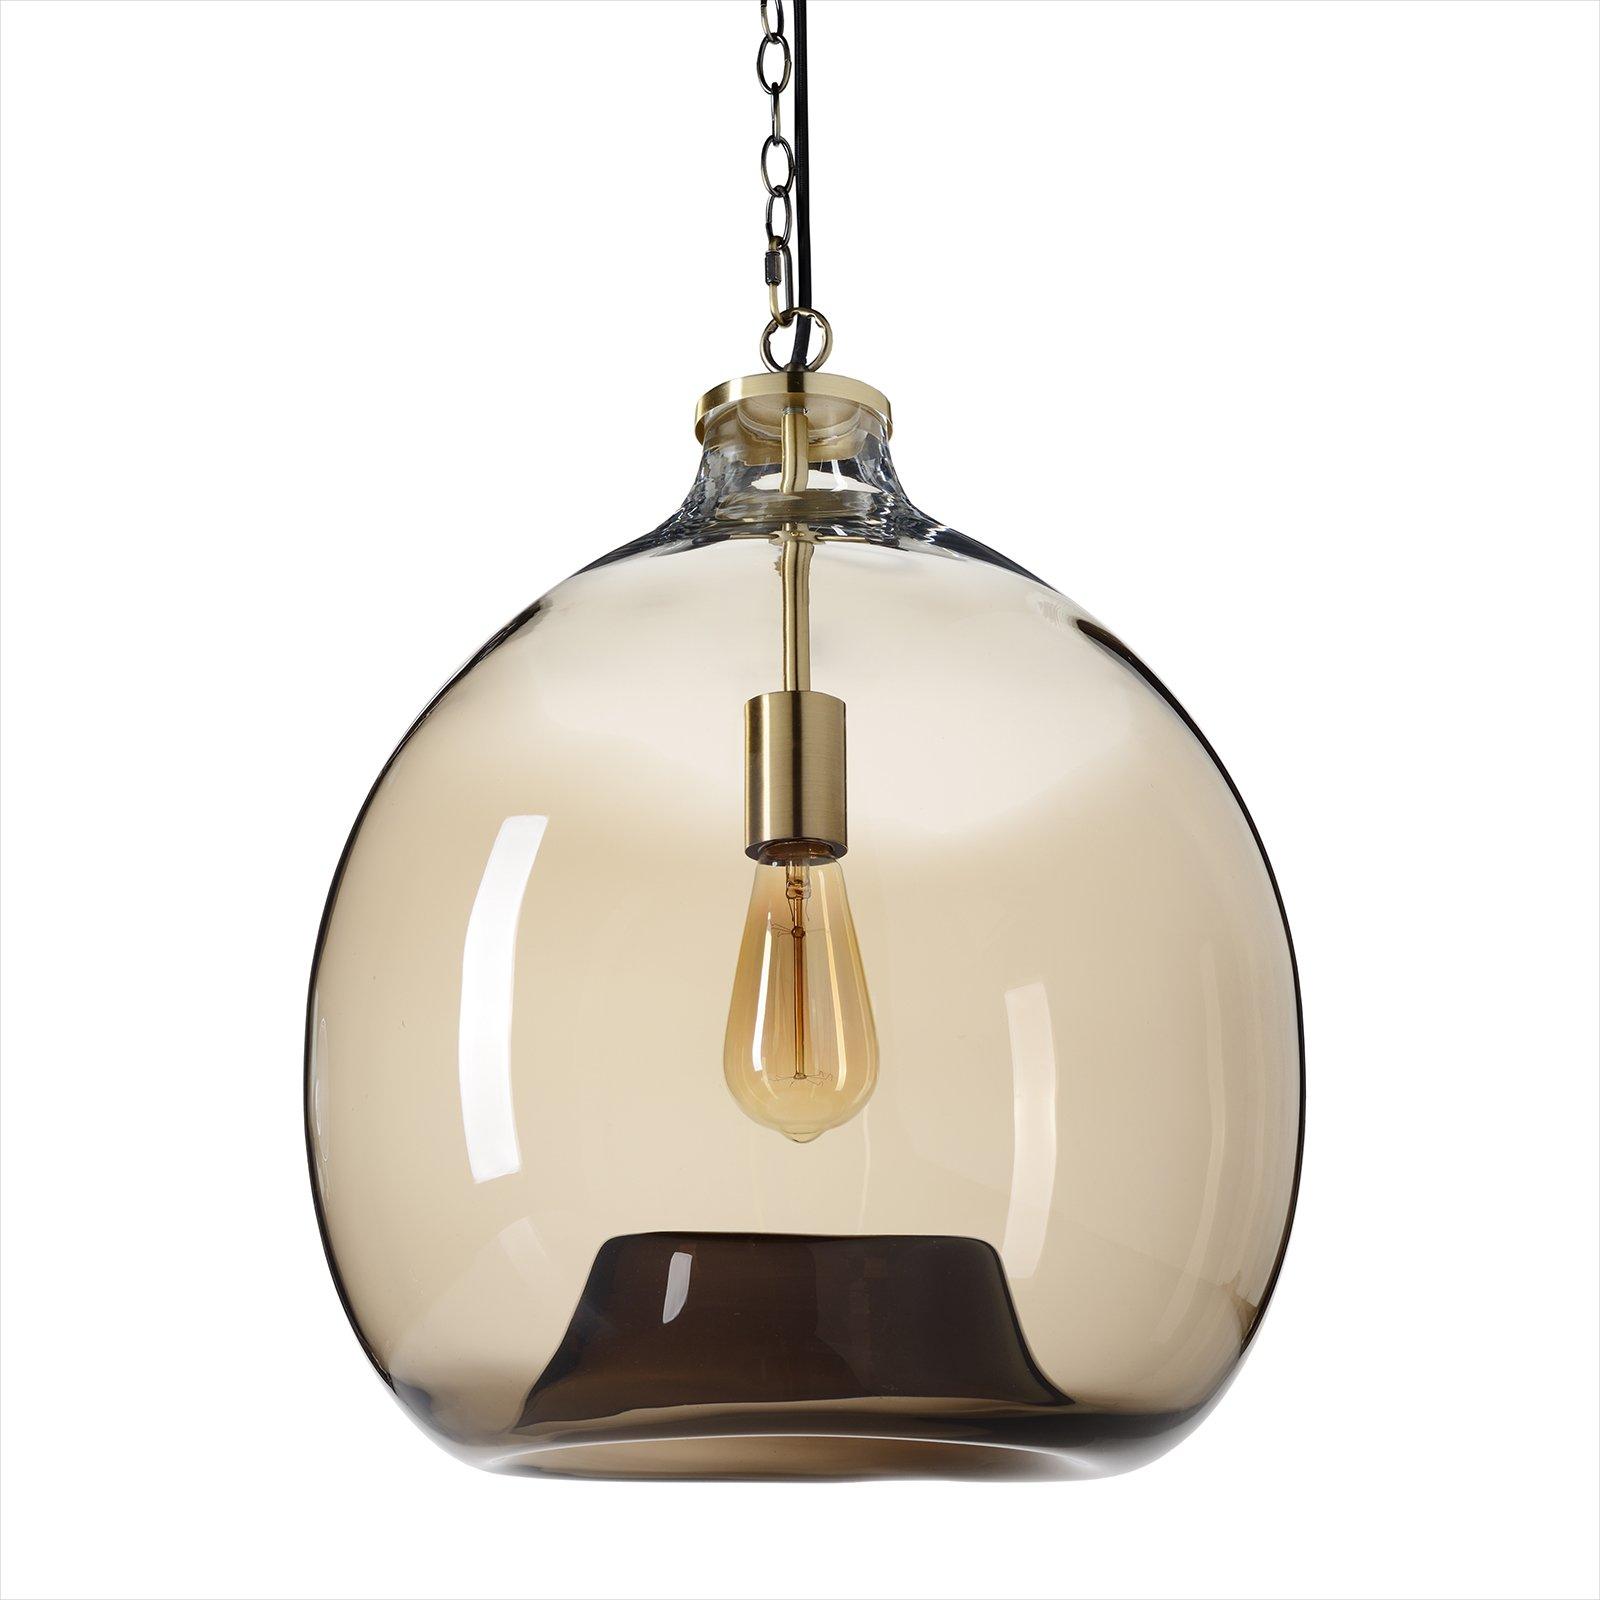 Kitchen Chandelier Brown: Casamotion Pendant Lighting Handblown Glass Drop Ceiling